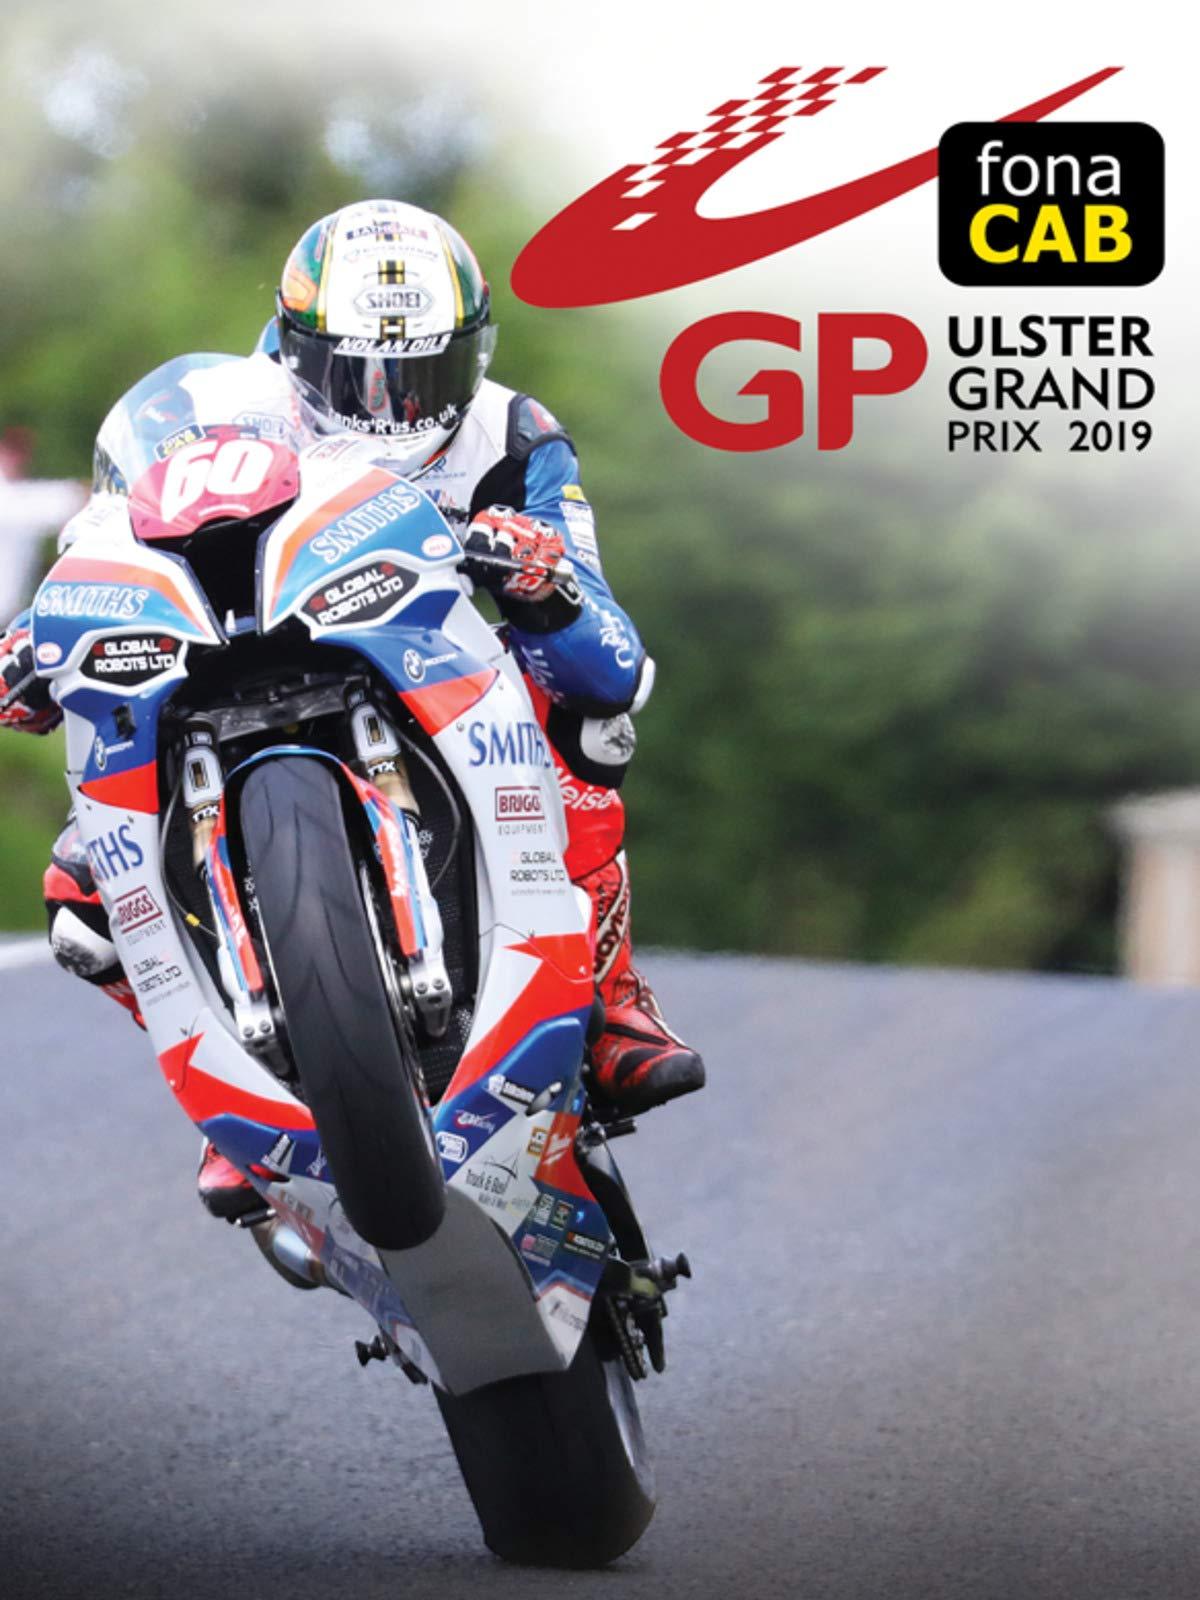 Ulster Grand Prix 2019